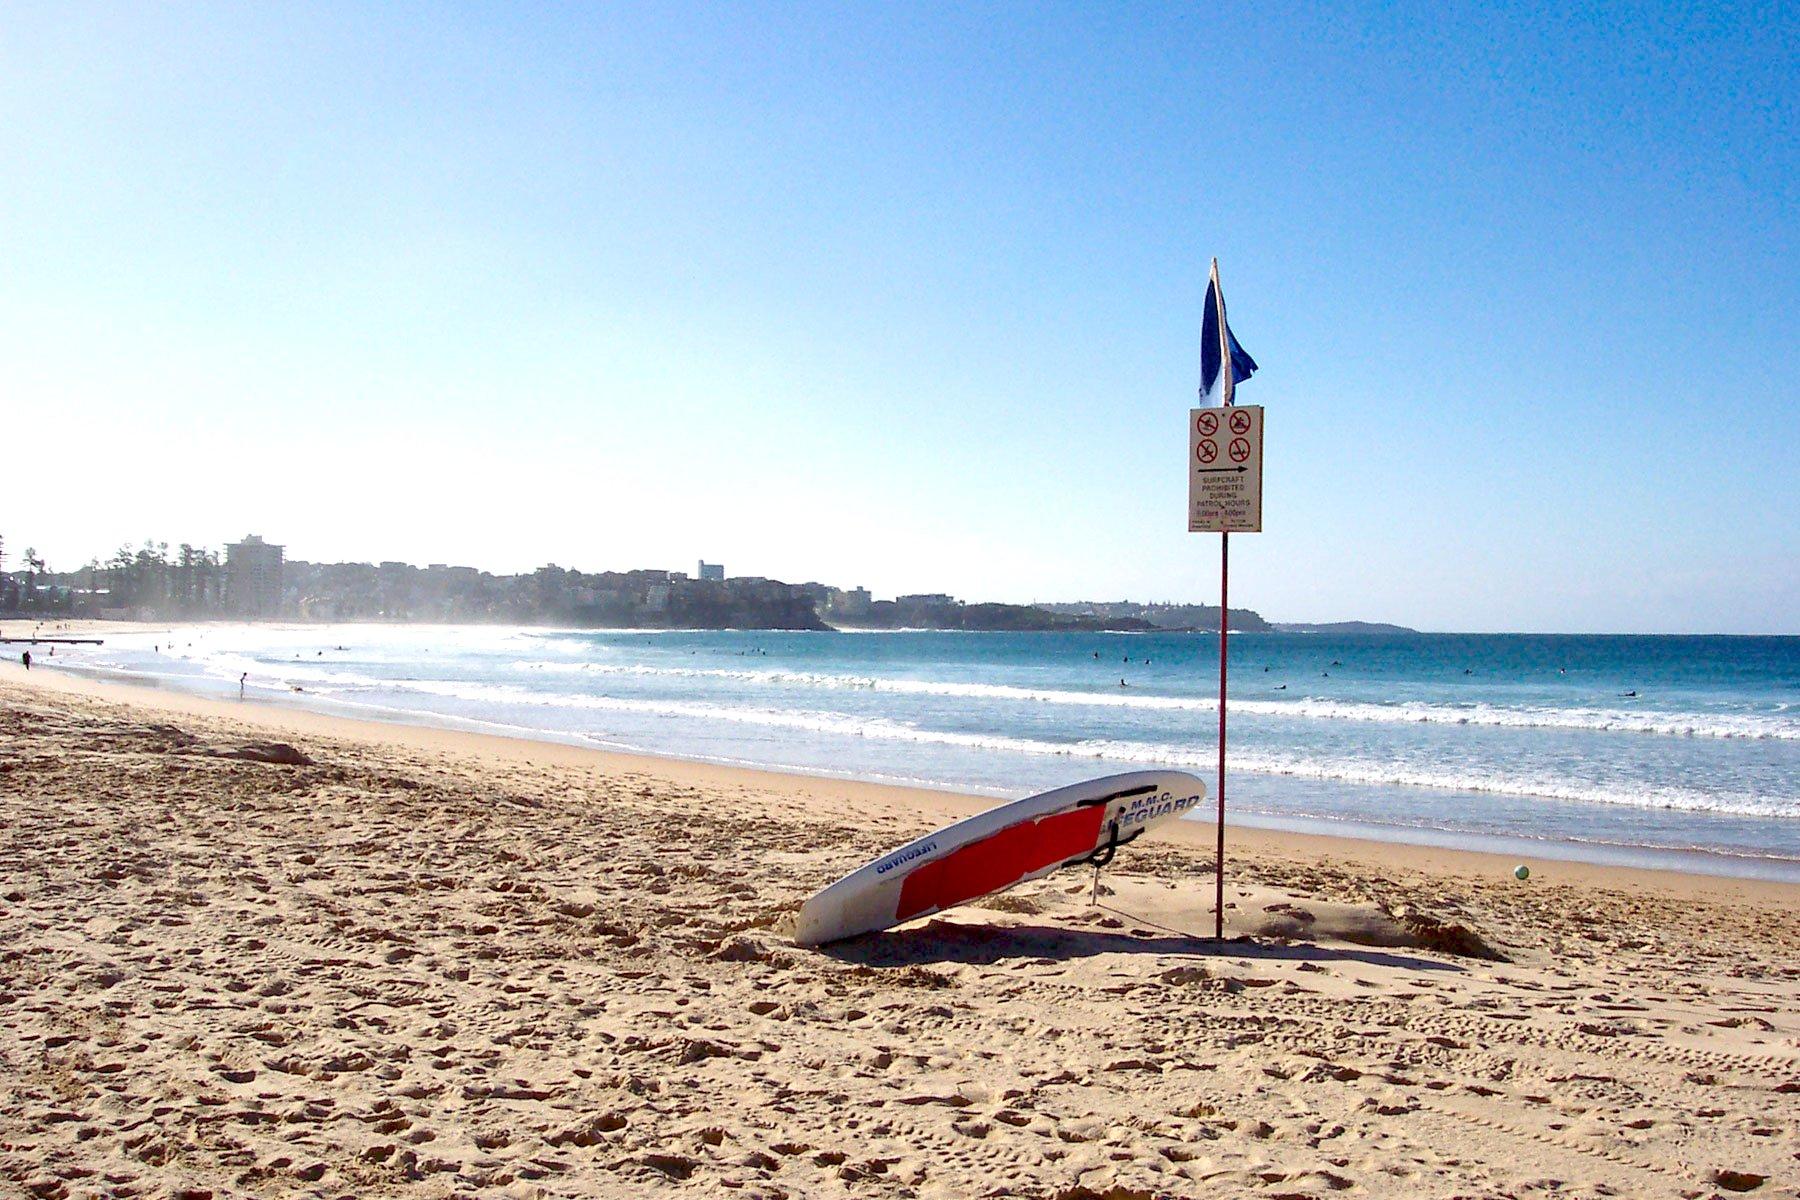 16- Manly Beach, Australia